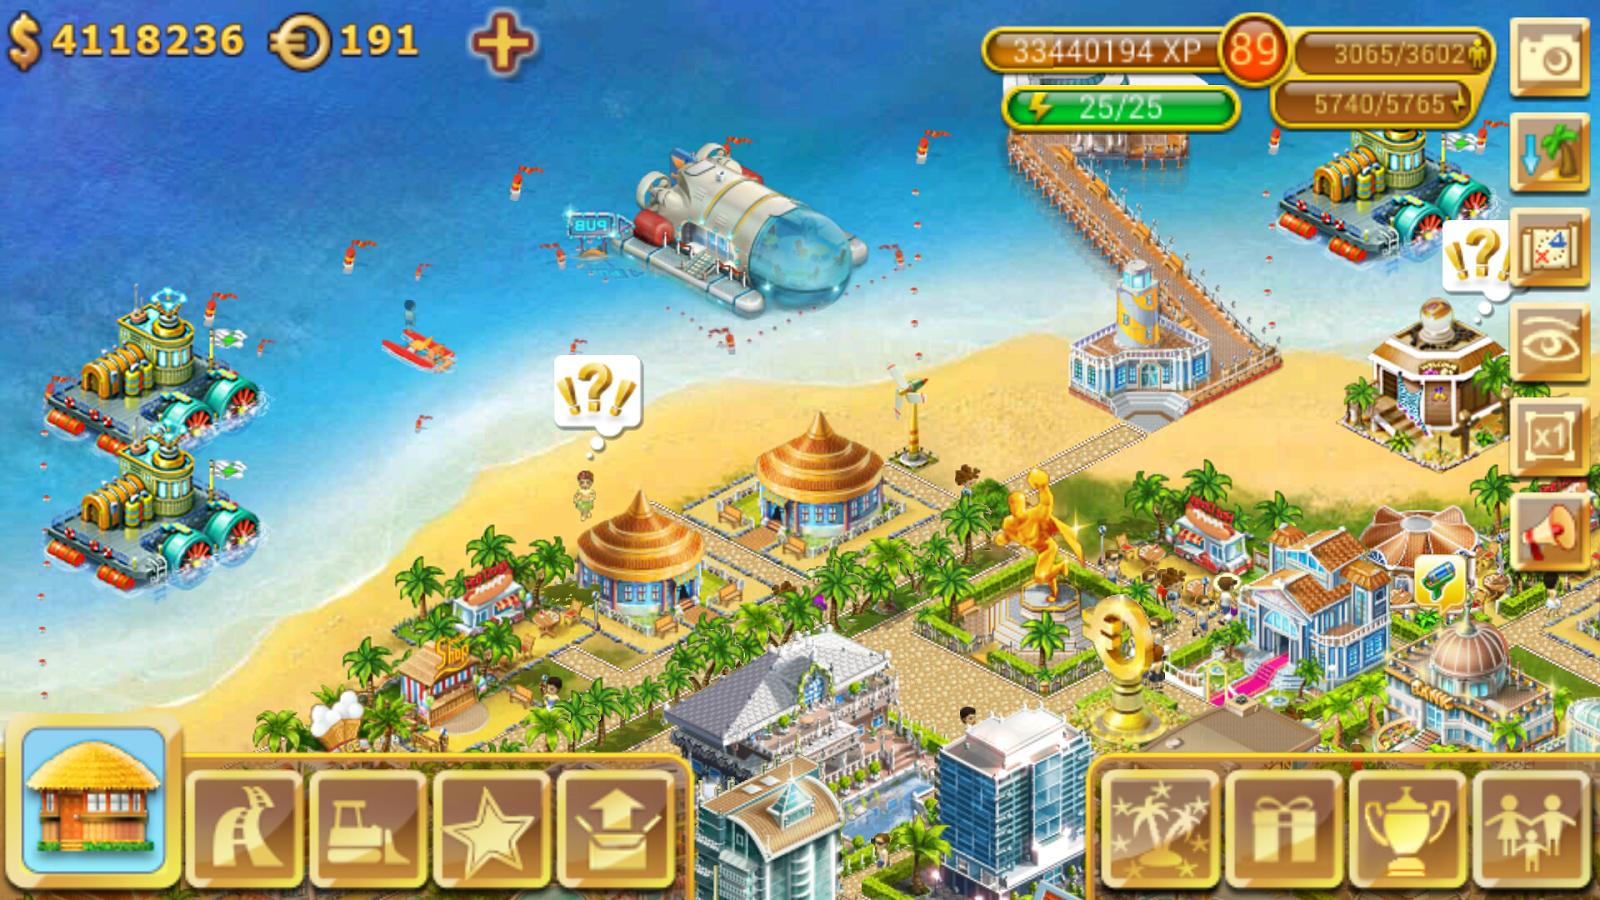 Скачать Paradise Island 4.0.5 для Android: https://trashbox.ru/topics/29069/paradise-island-3.2.18